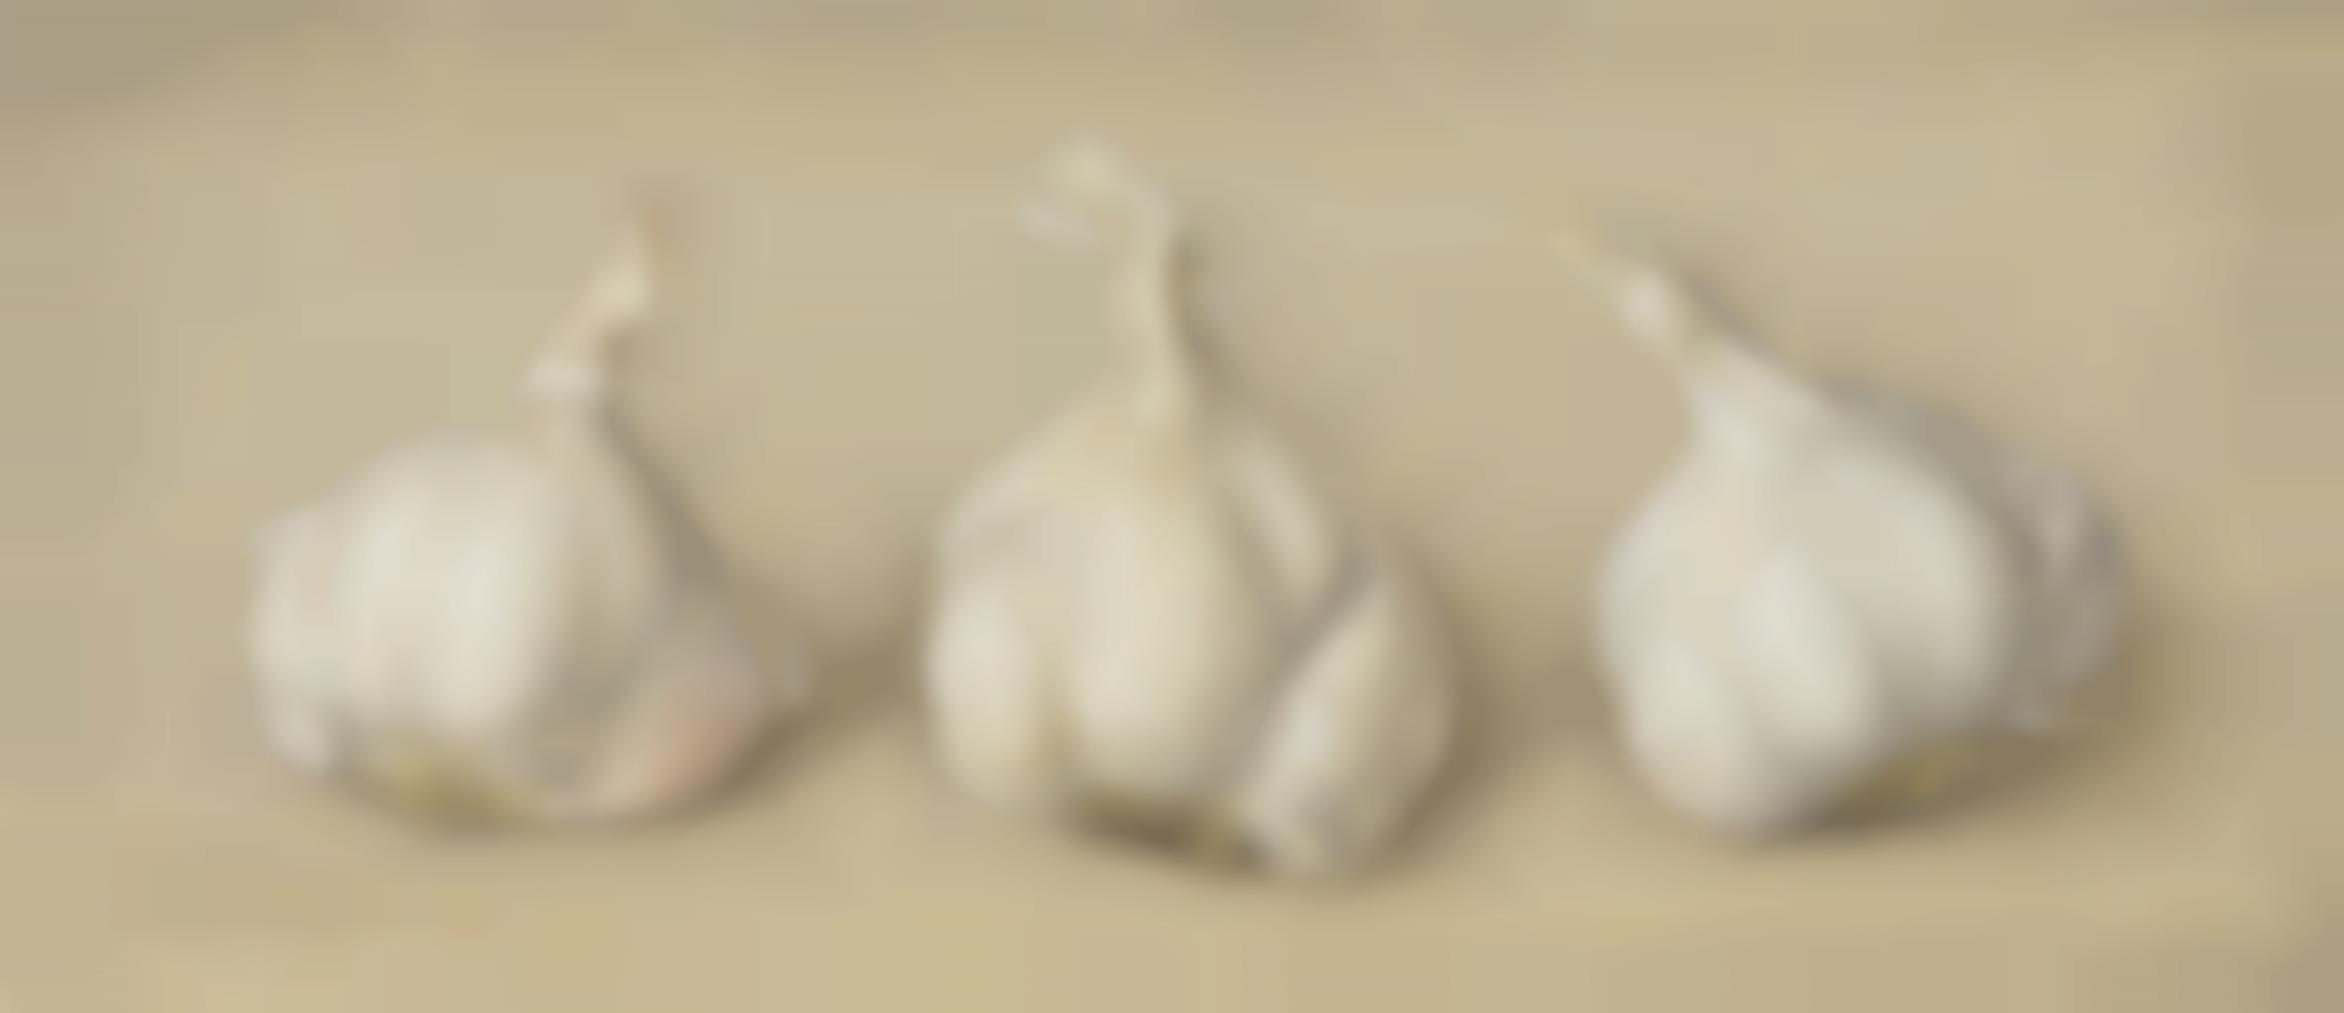 Eliot Hodgkin-Three Garlic Bulbs-1974